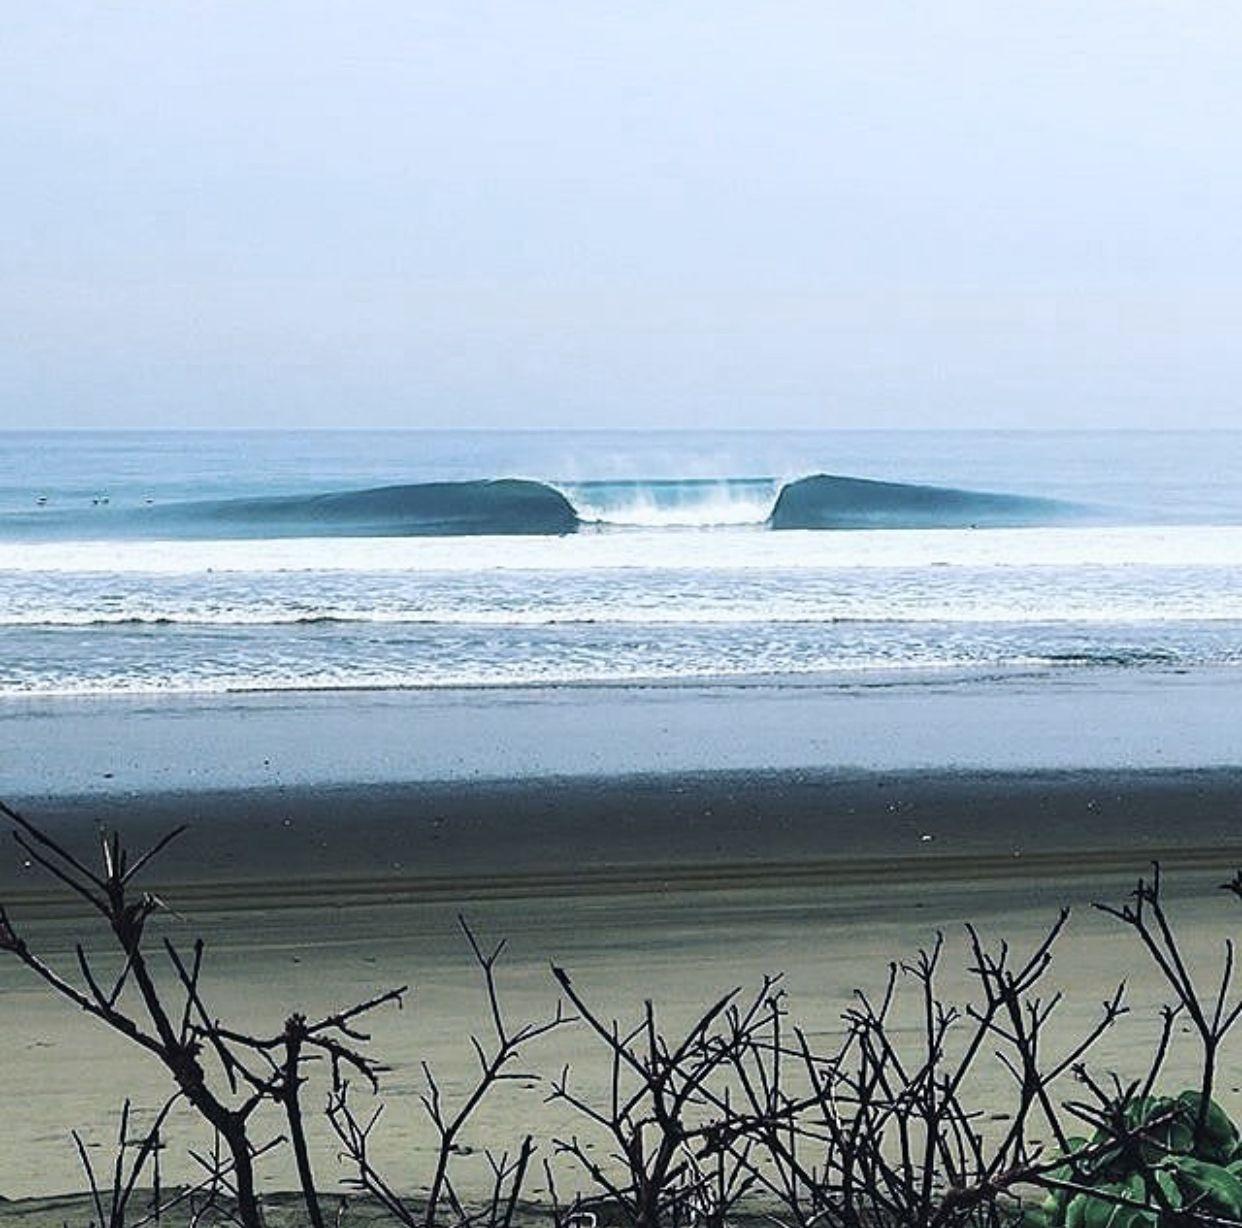 Pin By Ciara Van Der Merwe On Surfing Kite Surfing Surfing Waves Surfing Pictures